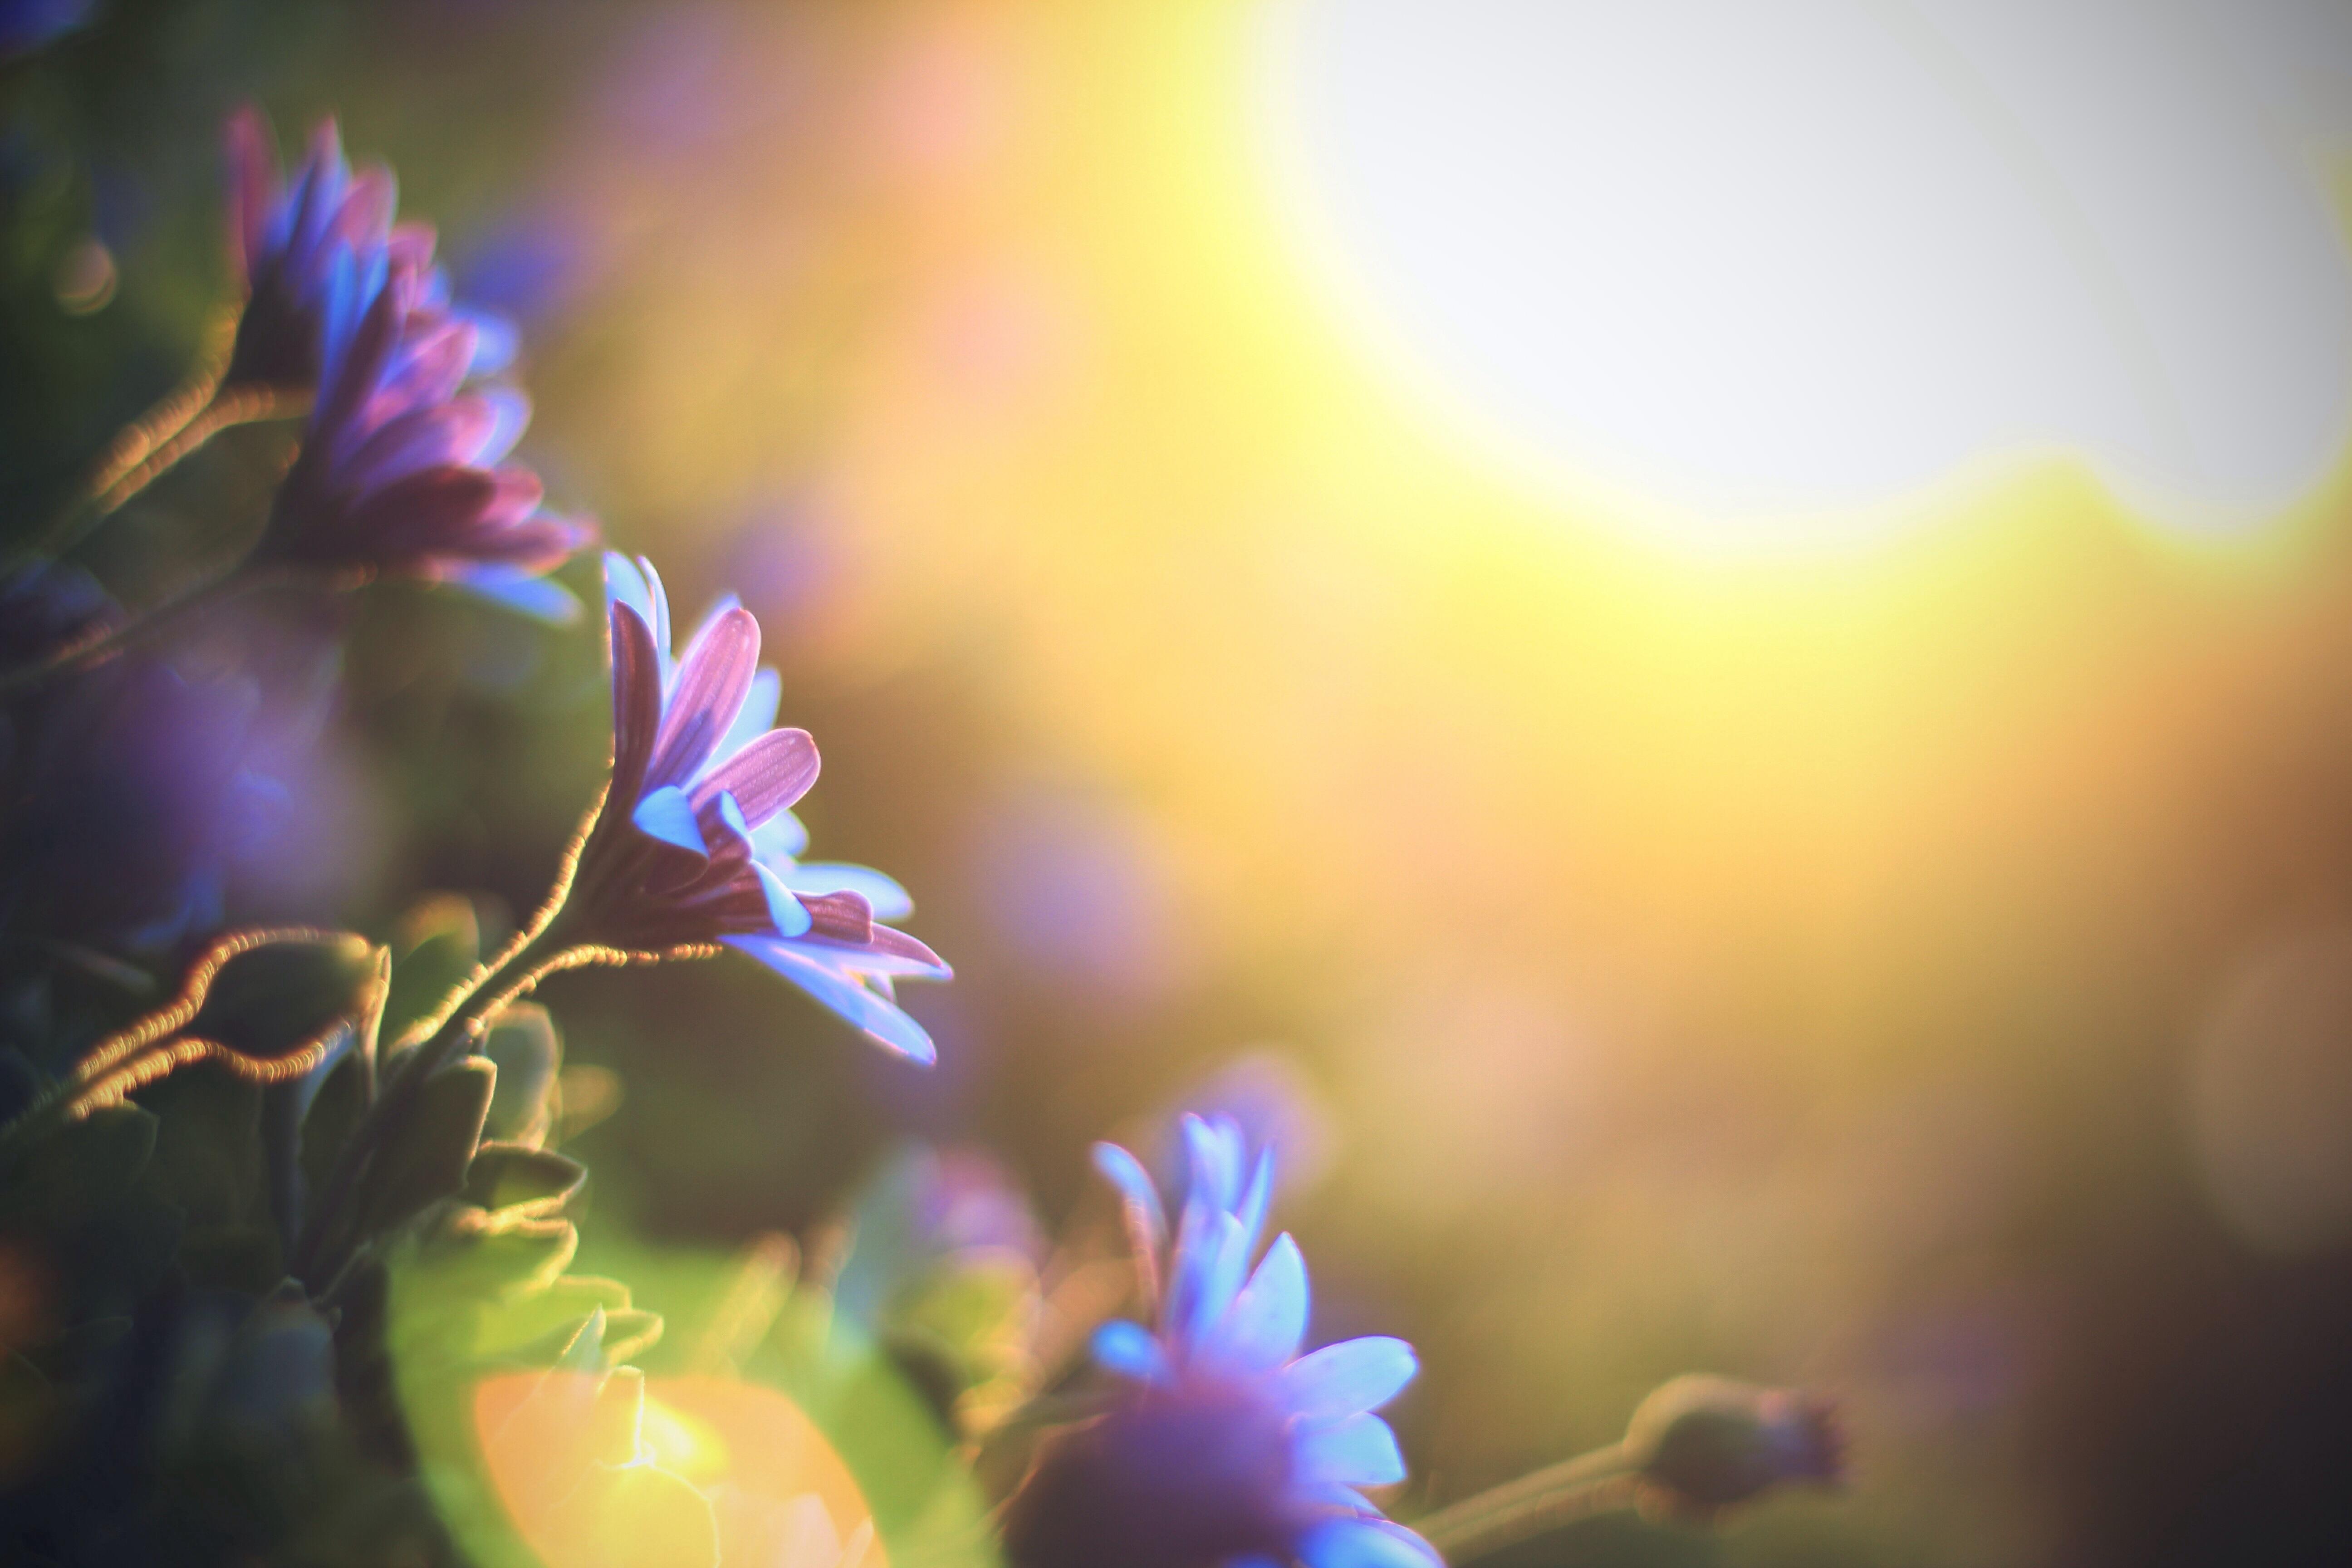 Wallpaper : sunlight, sunset, nature, sky, purple, branch